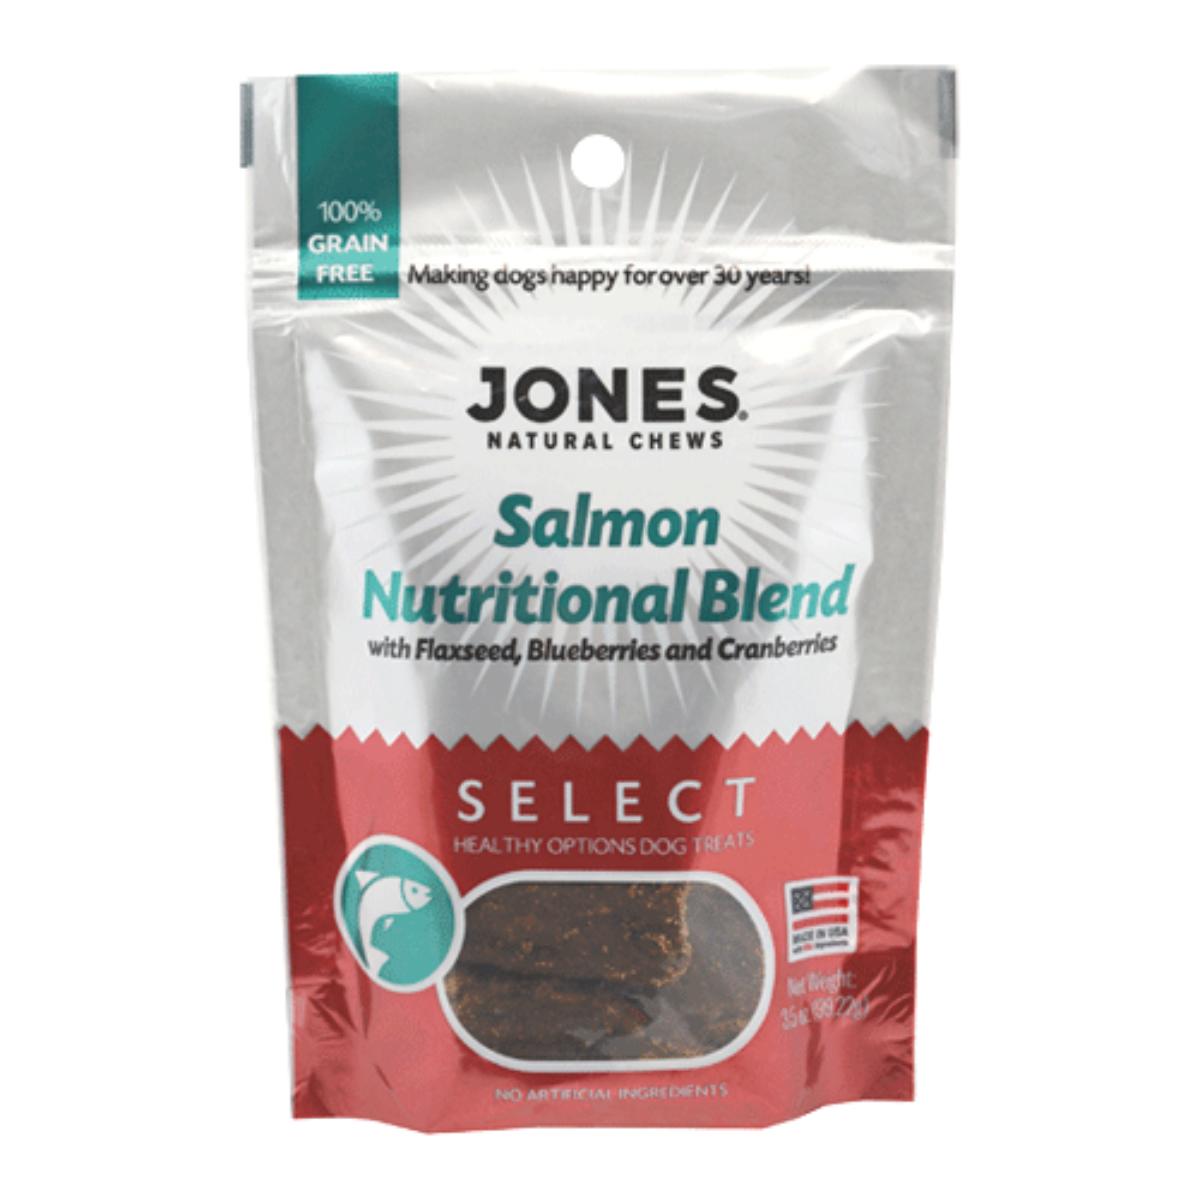 Jones Select Dog Treat - Salmon Nutritional Blend